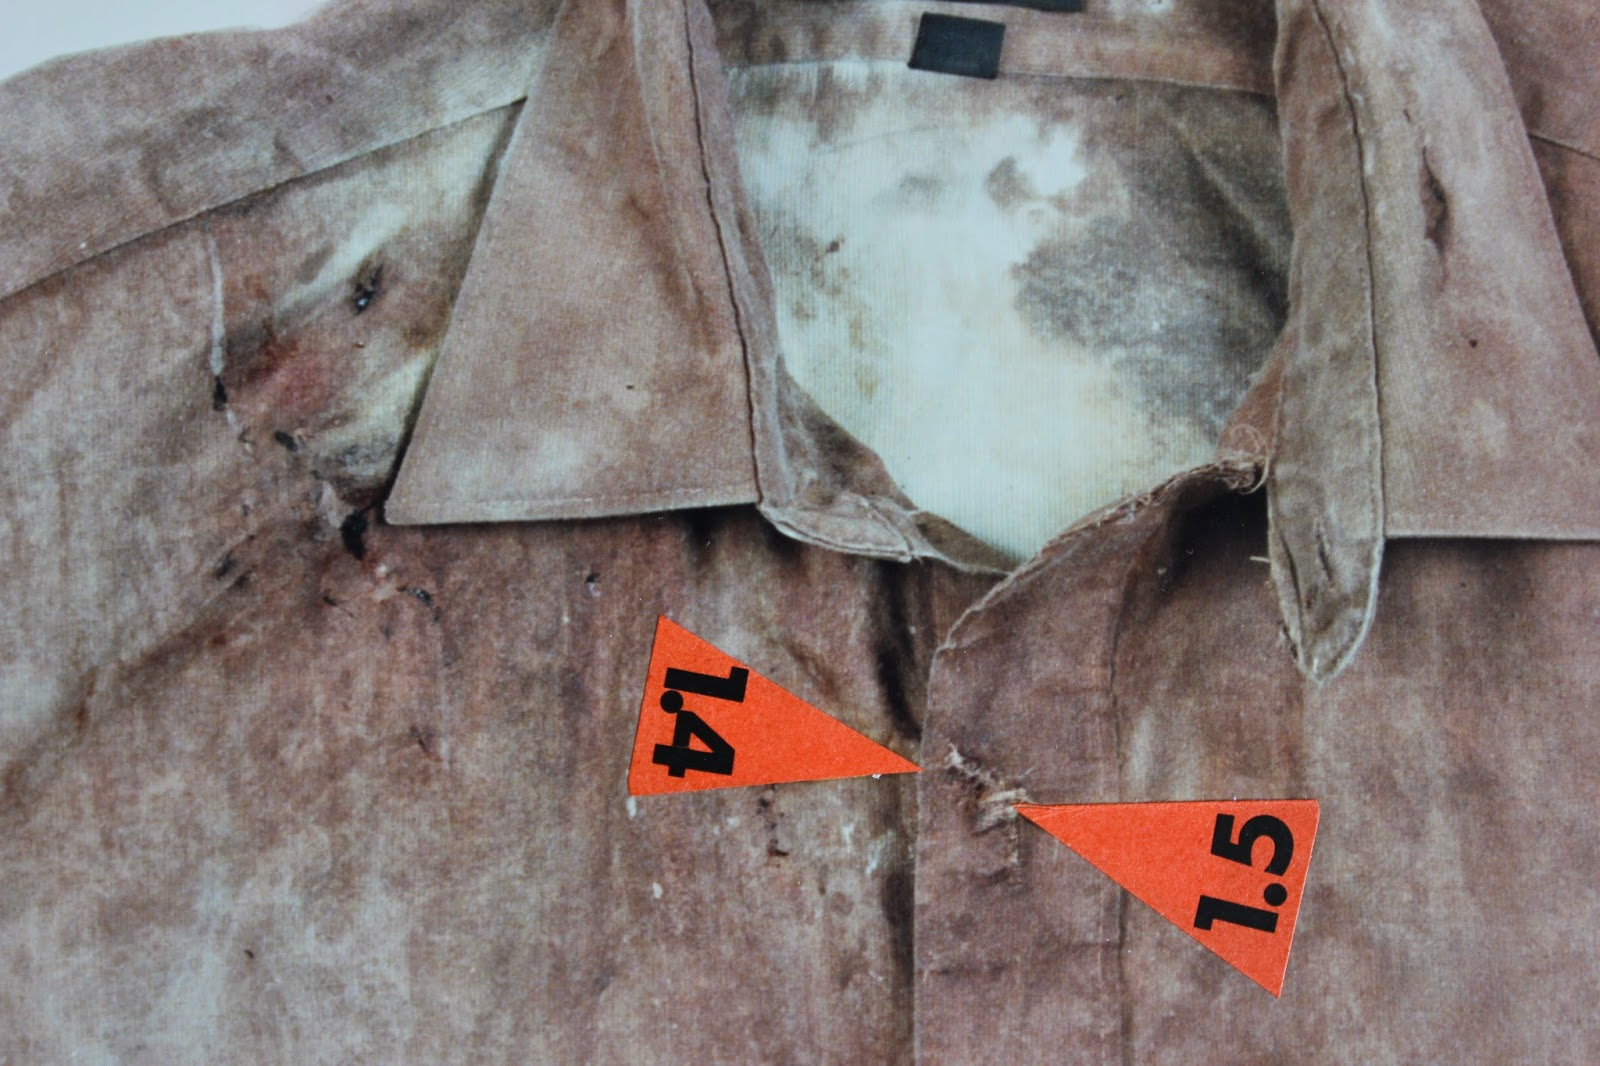 Olof Palmes skjorta 5